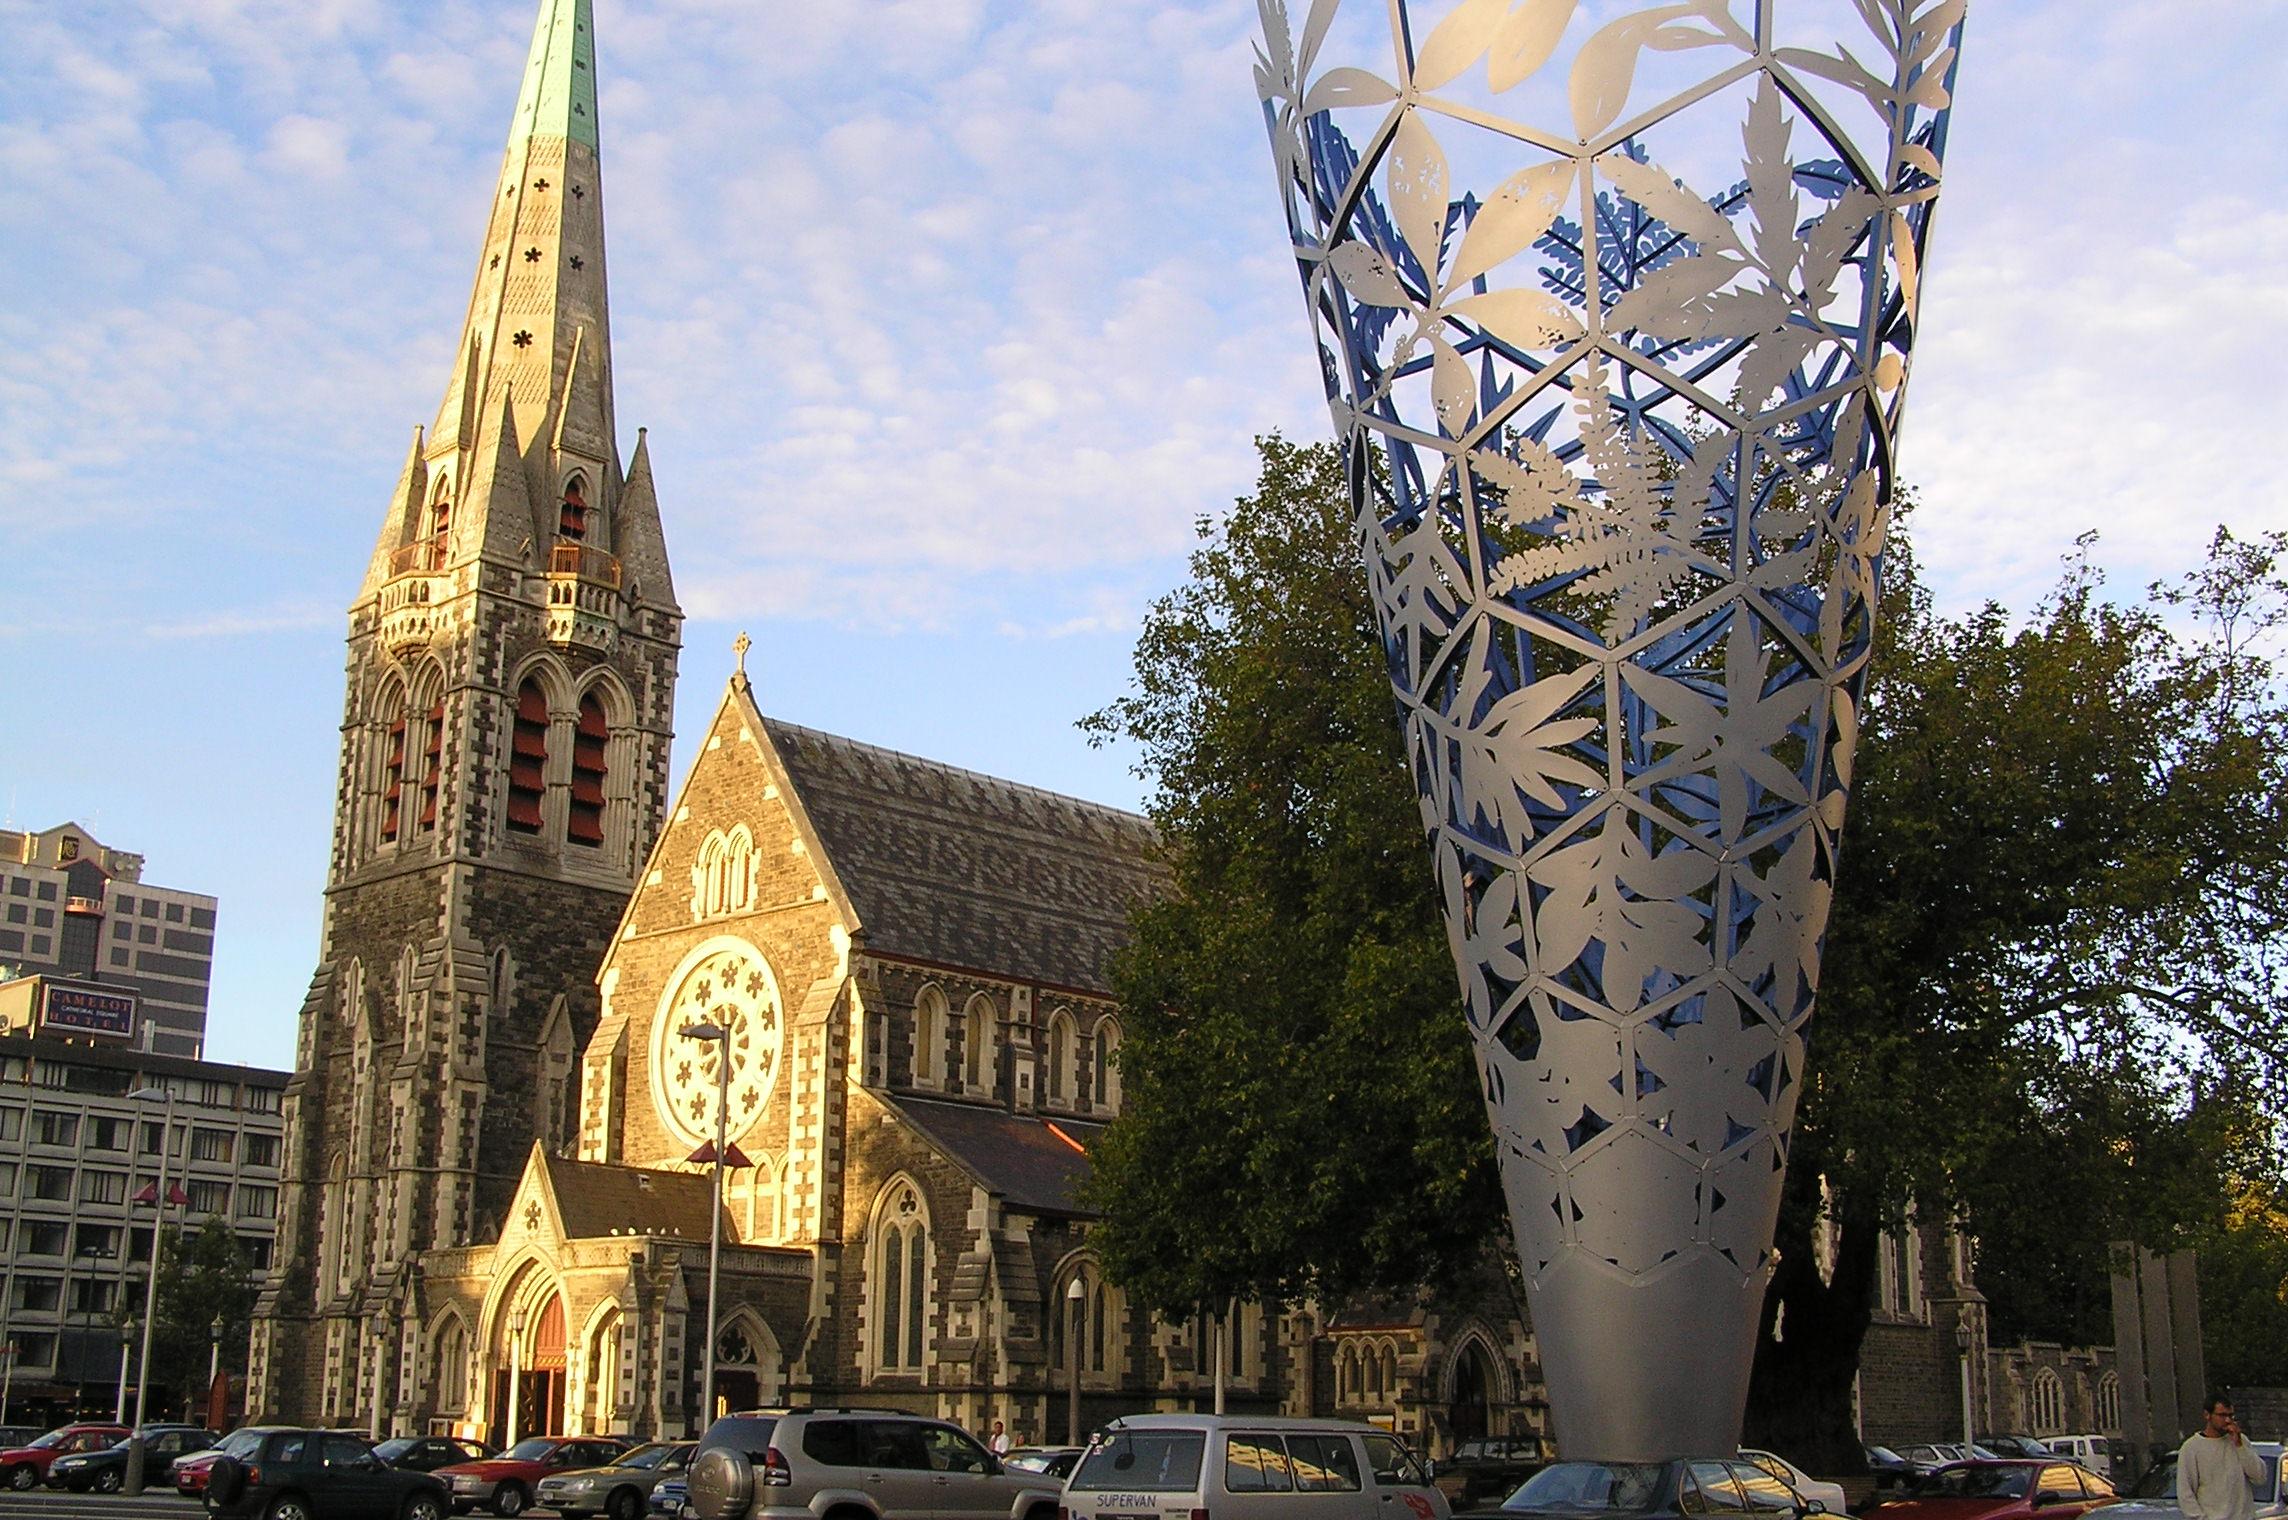 New Zealand – Tìm hiểu các điểm đến du học hấp dẫn